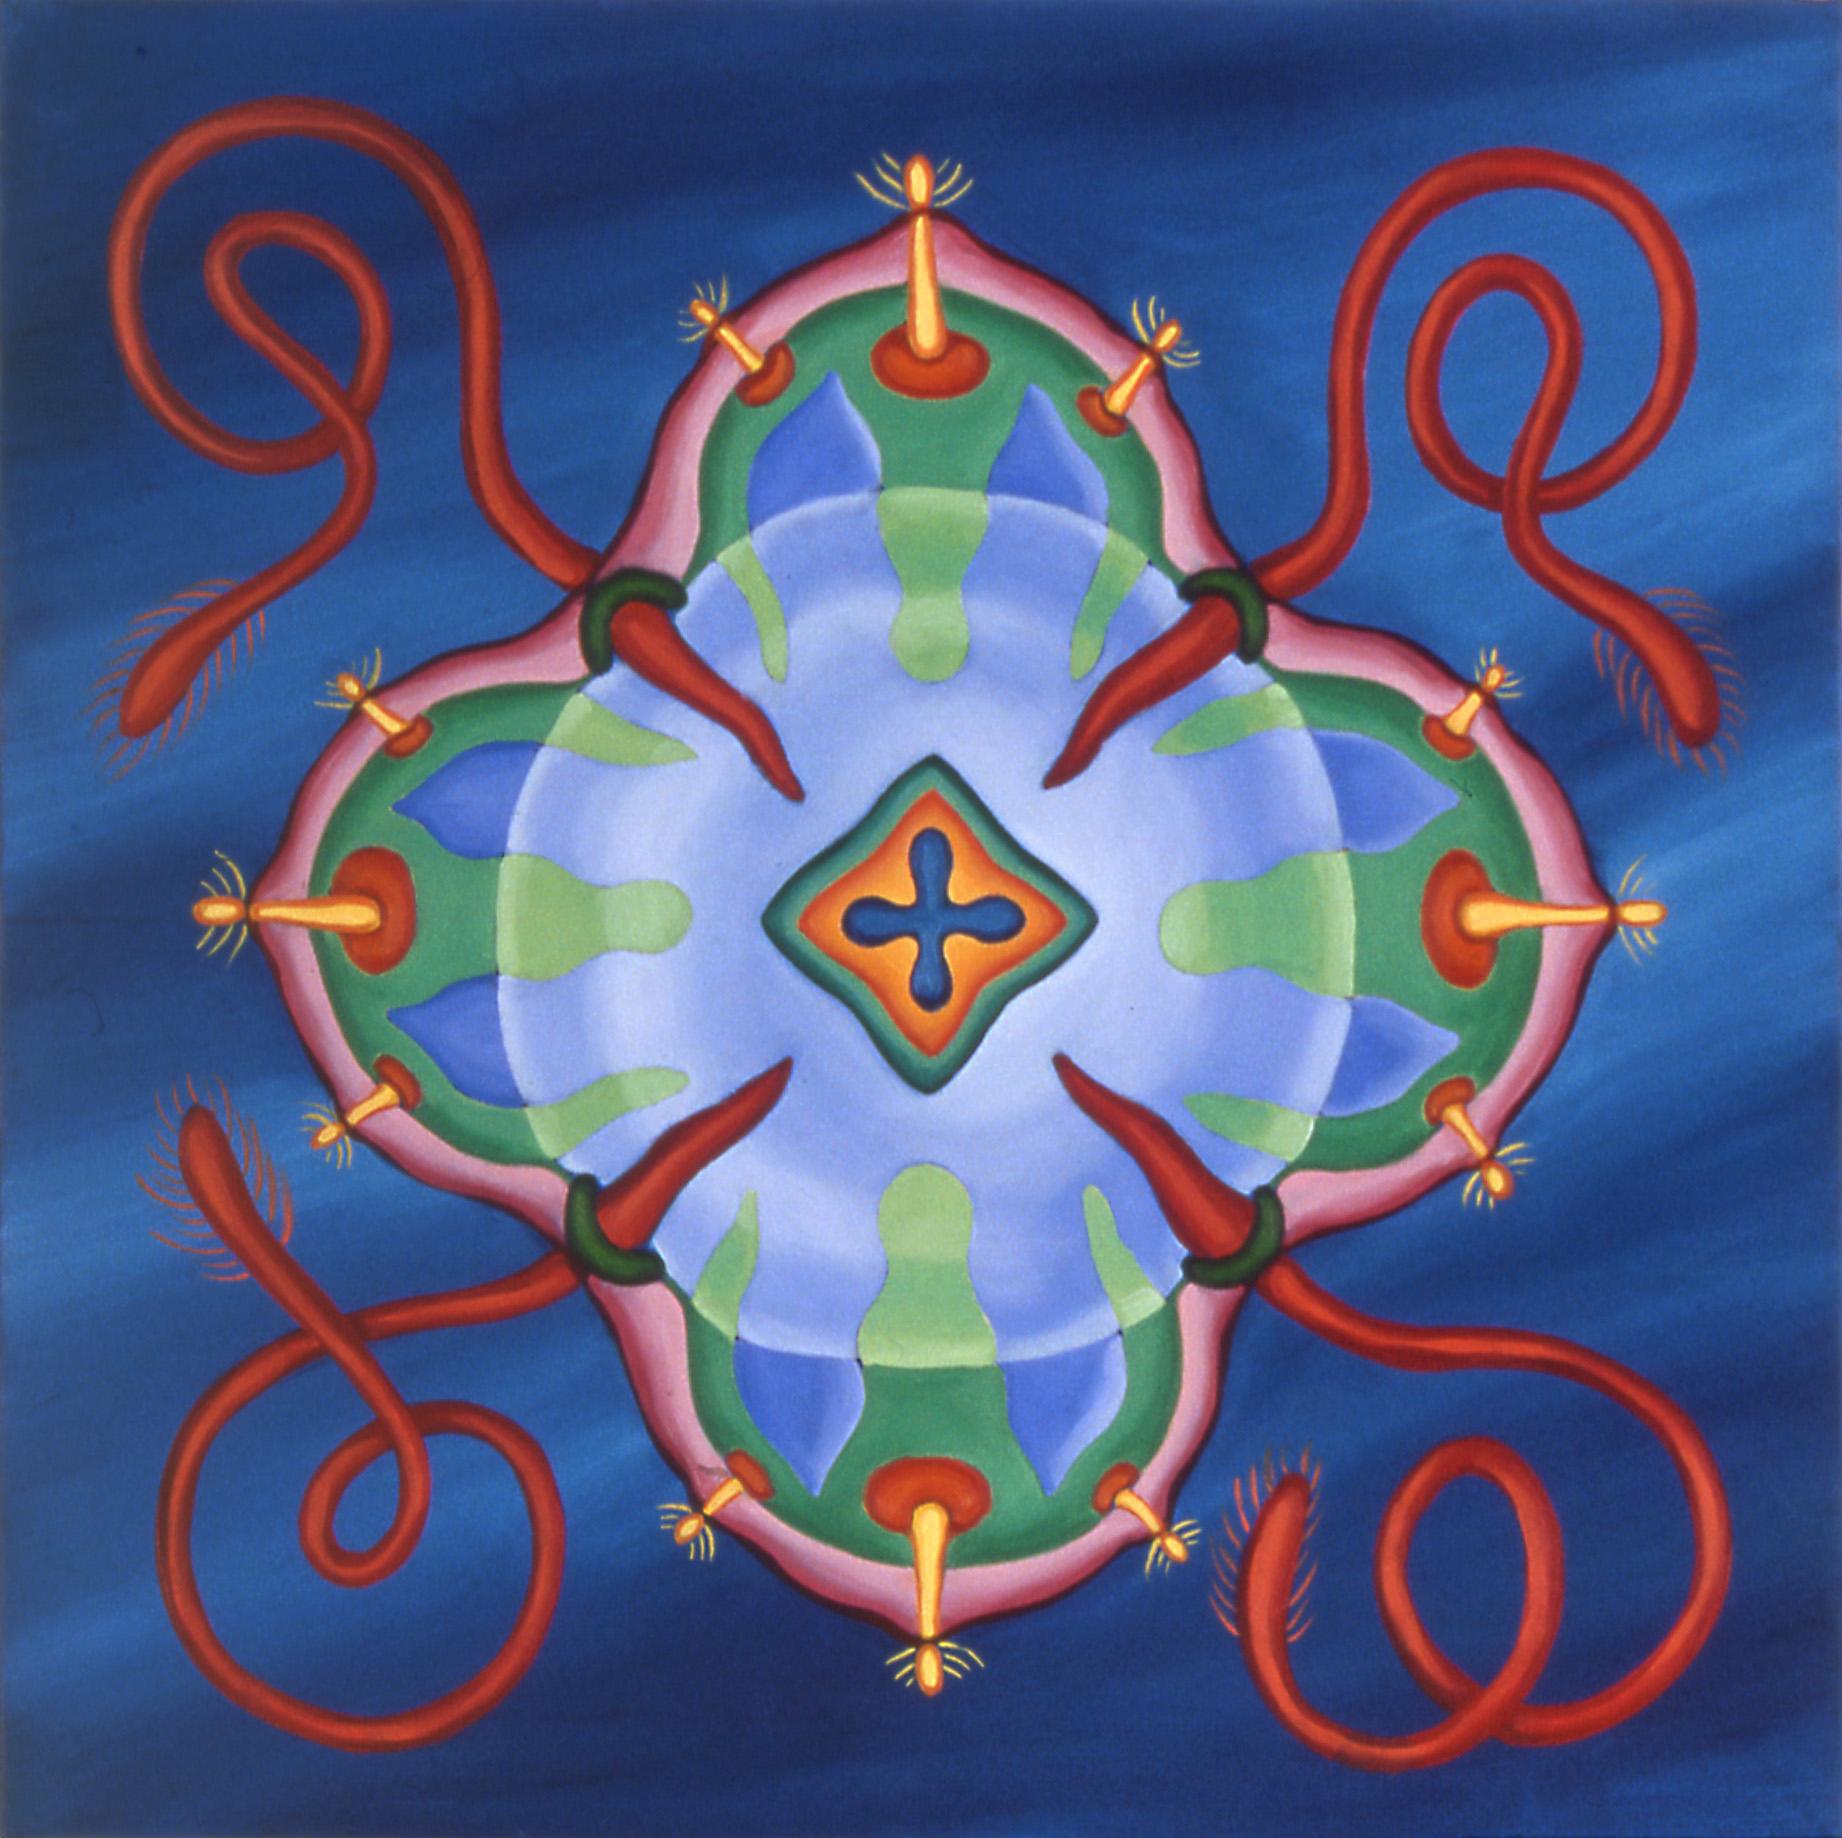 Blue Jellyfish 4, 2003